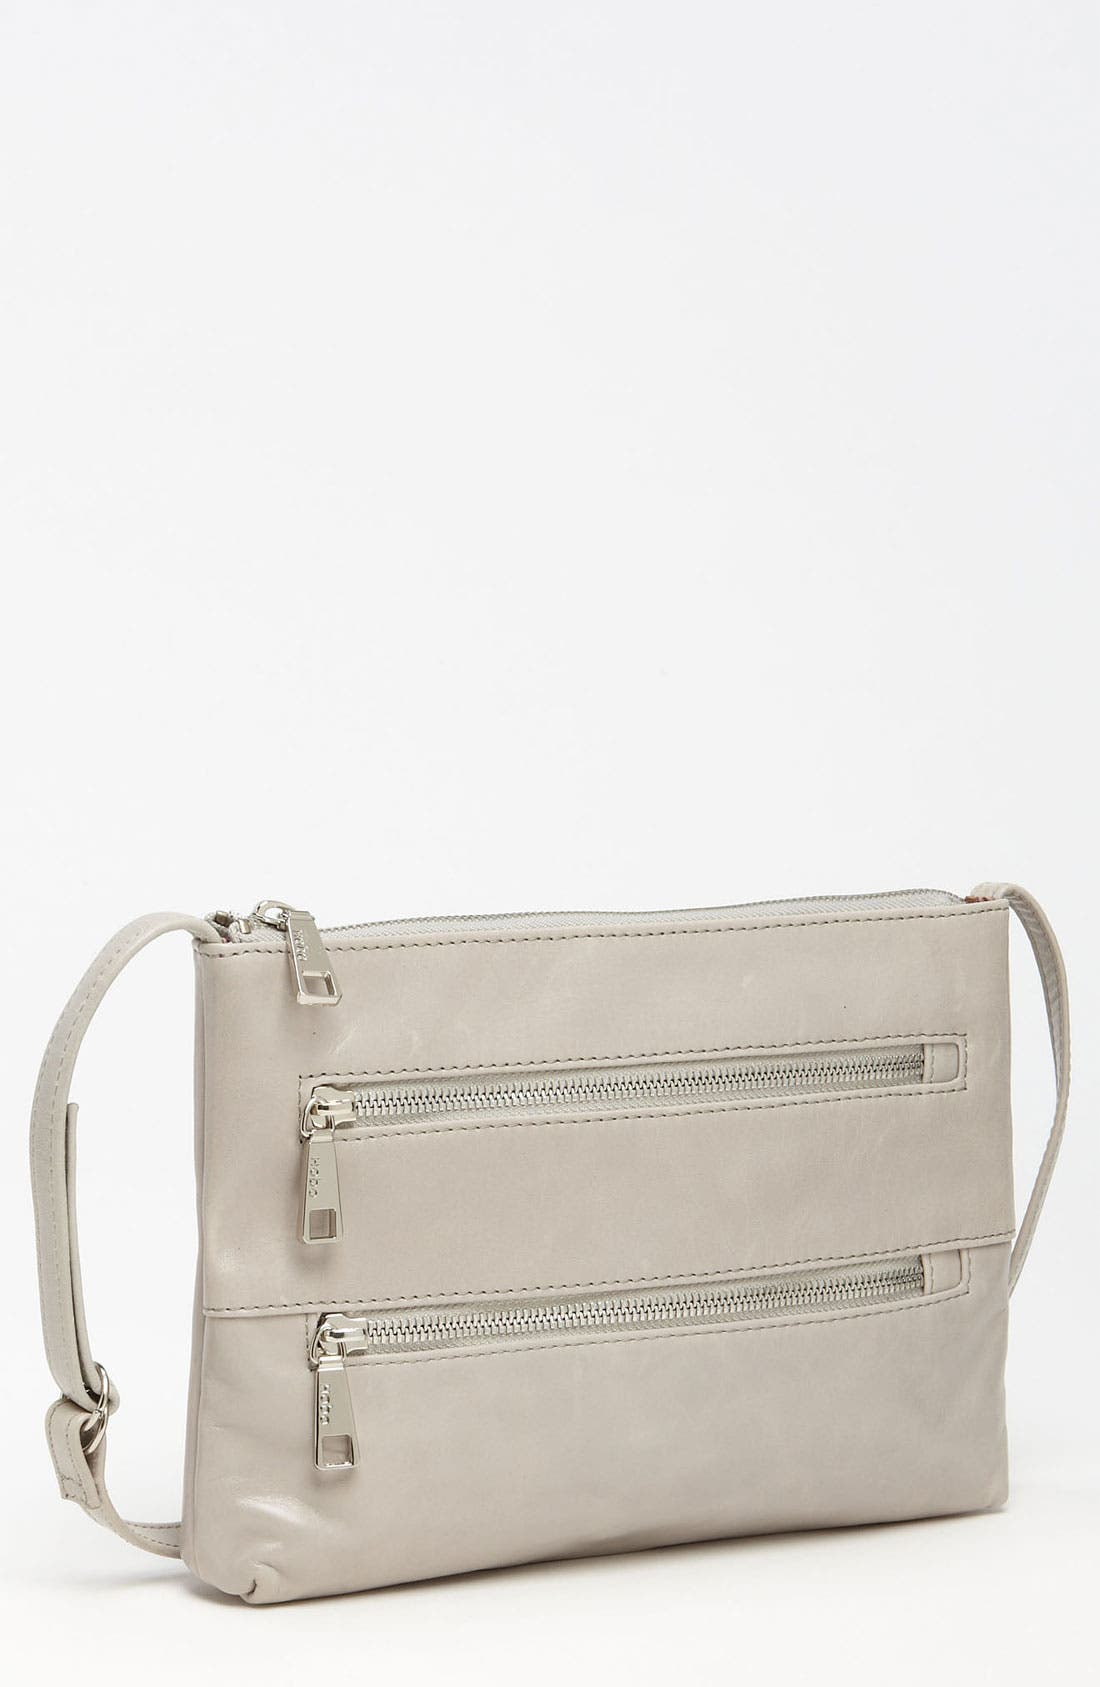 Main Image - Hobo 'Mara' Crossbody Bag